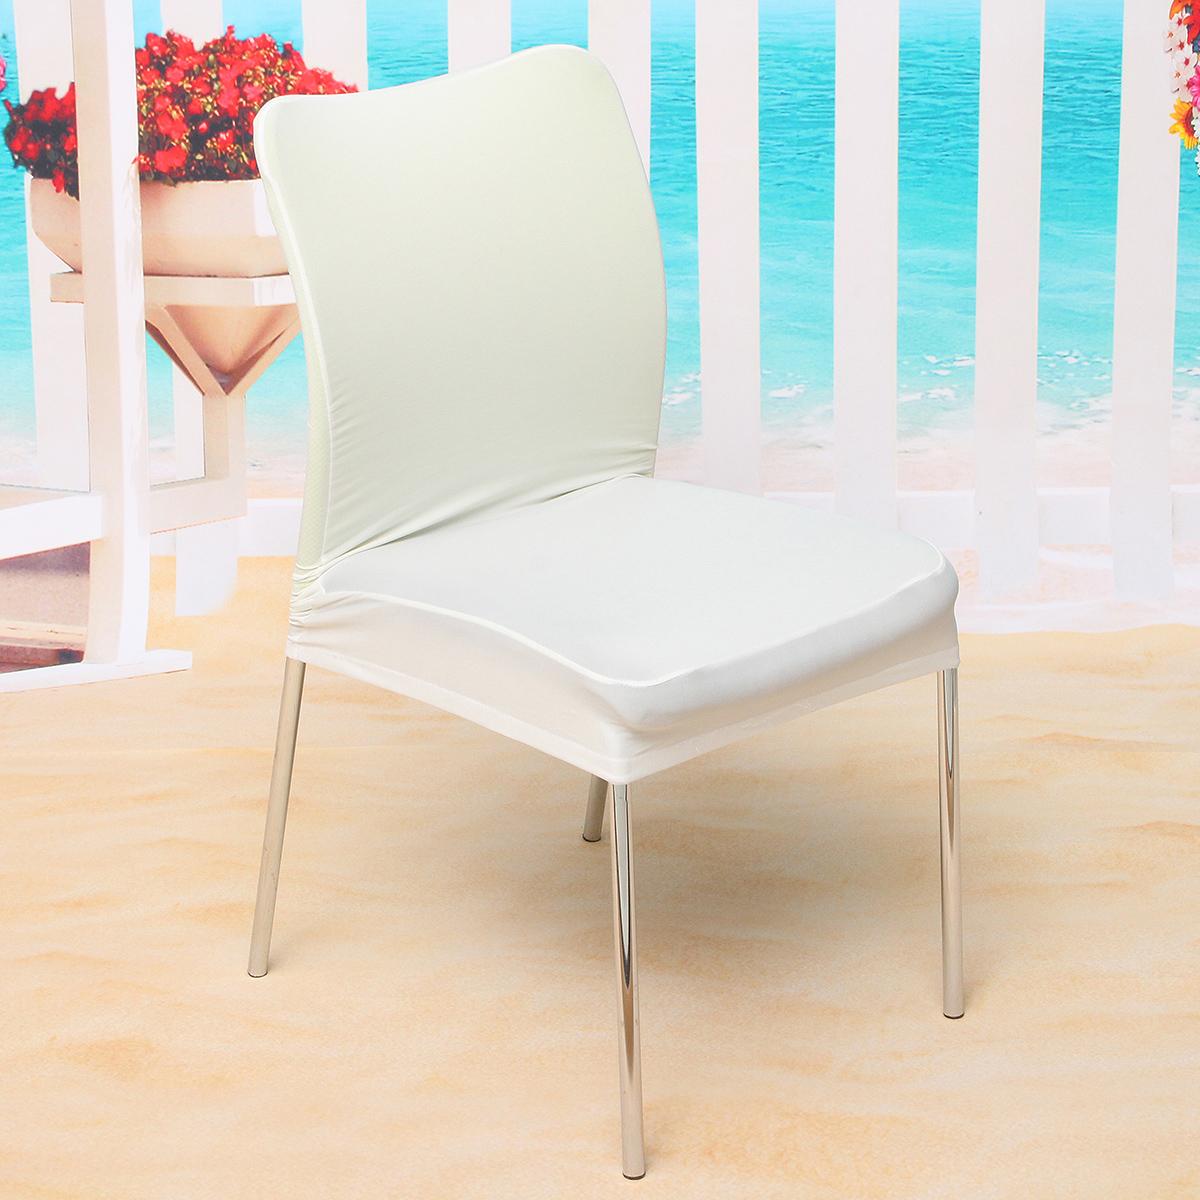 Fabric To Cover Dining Room Chairs 709 Jasper Rocker Recliner La Plastic Seat